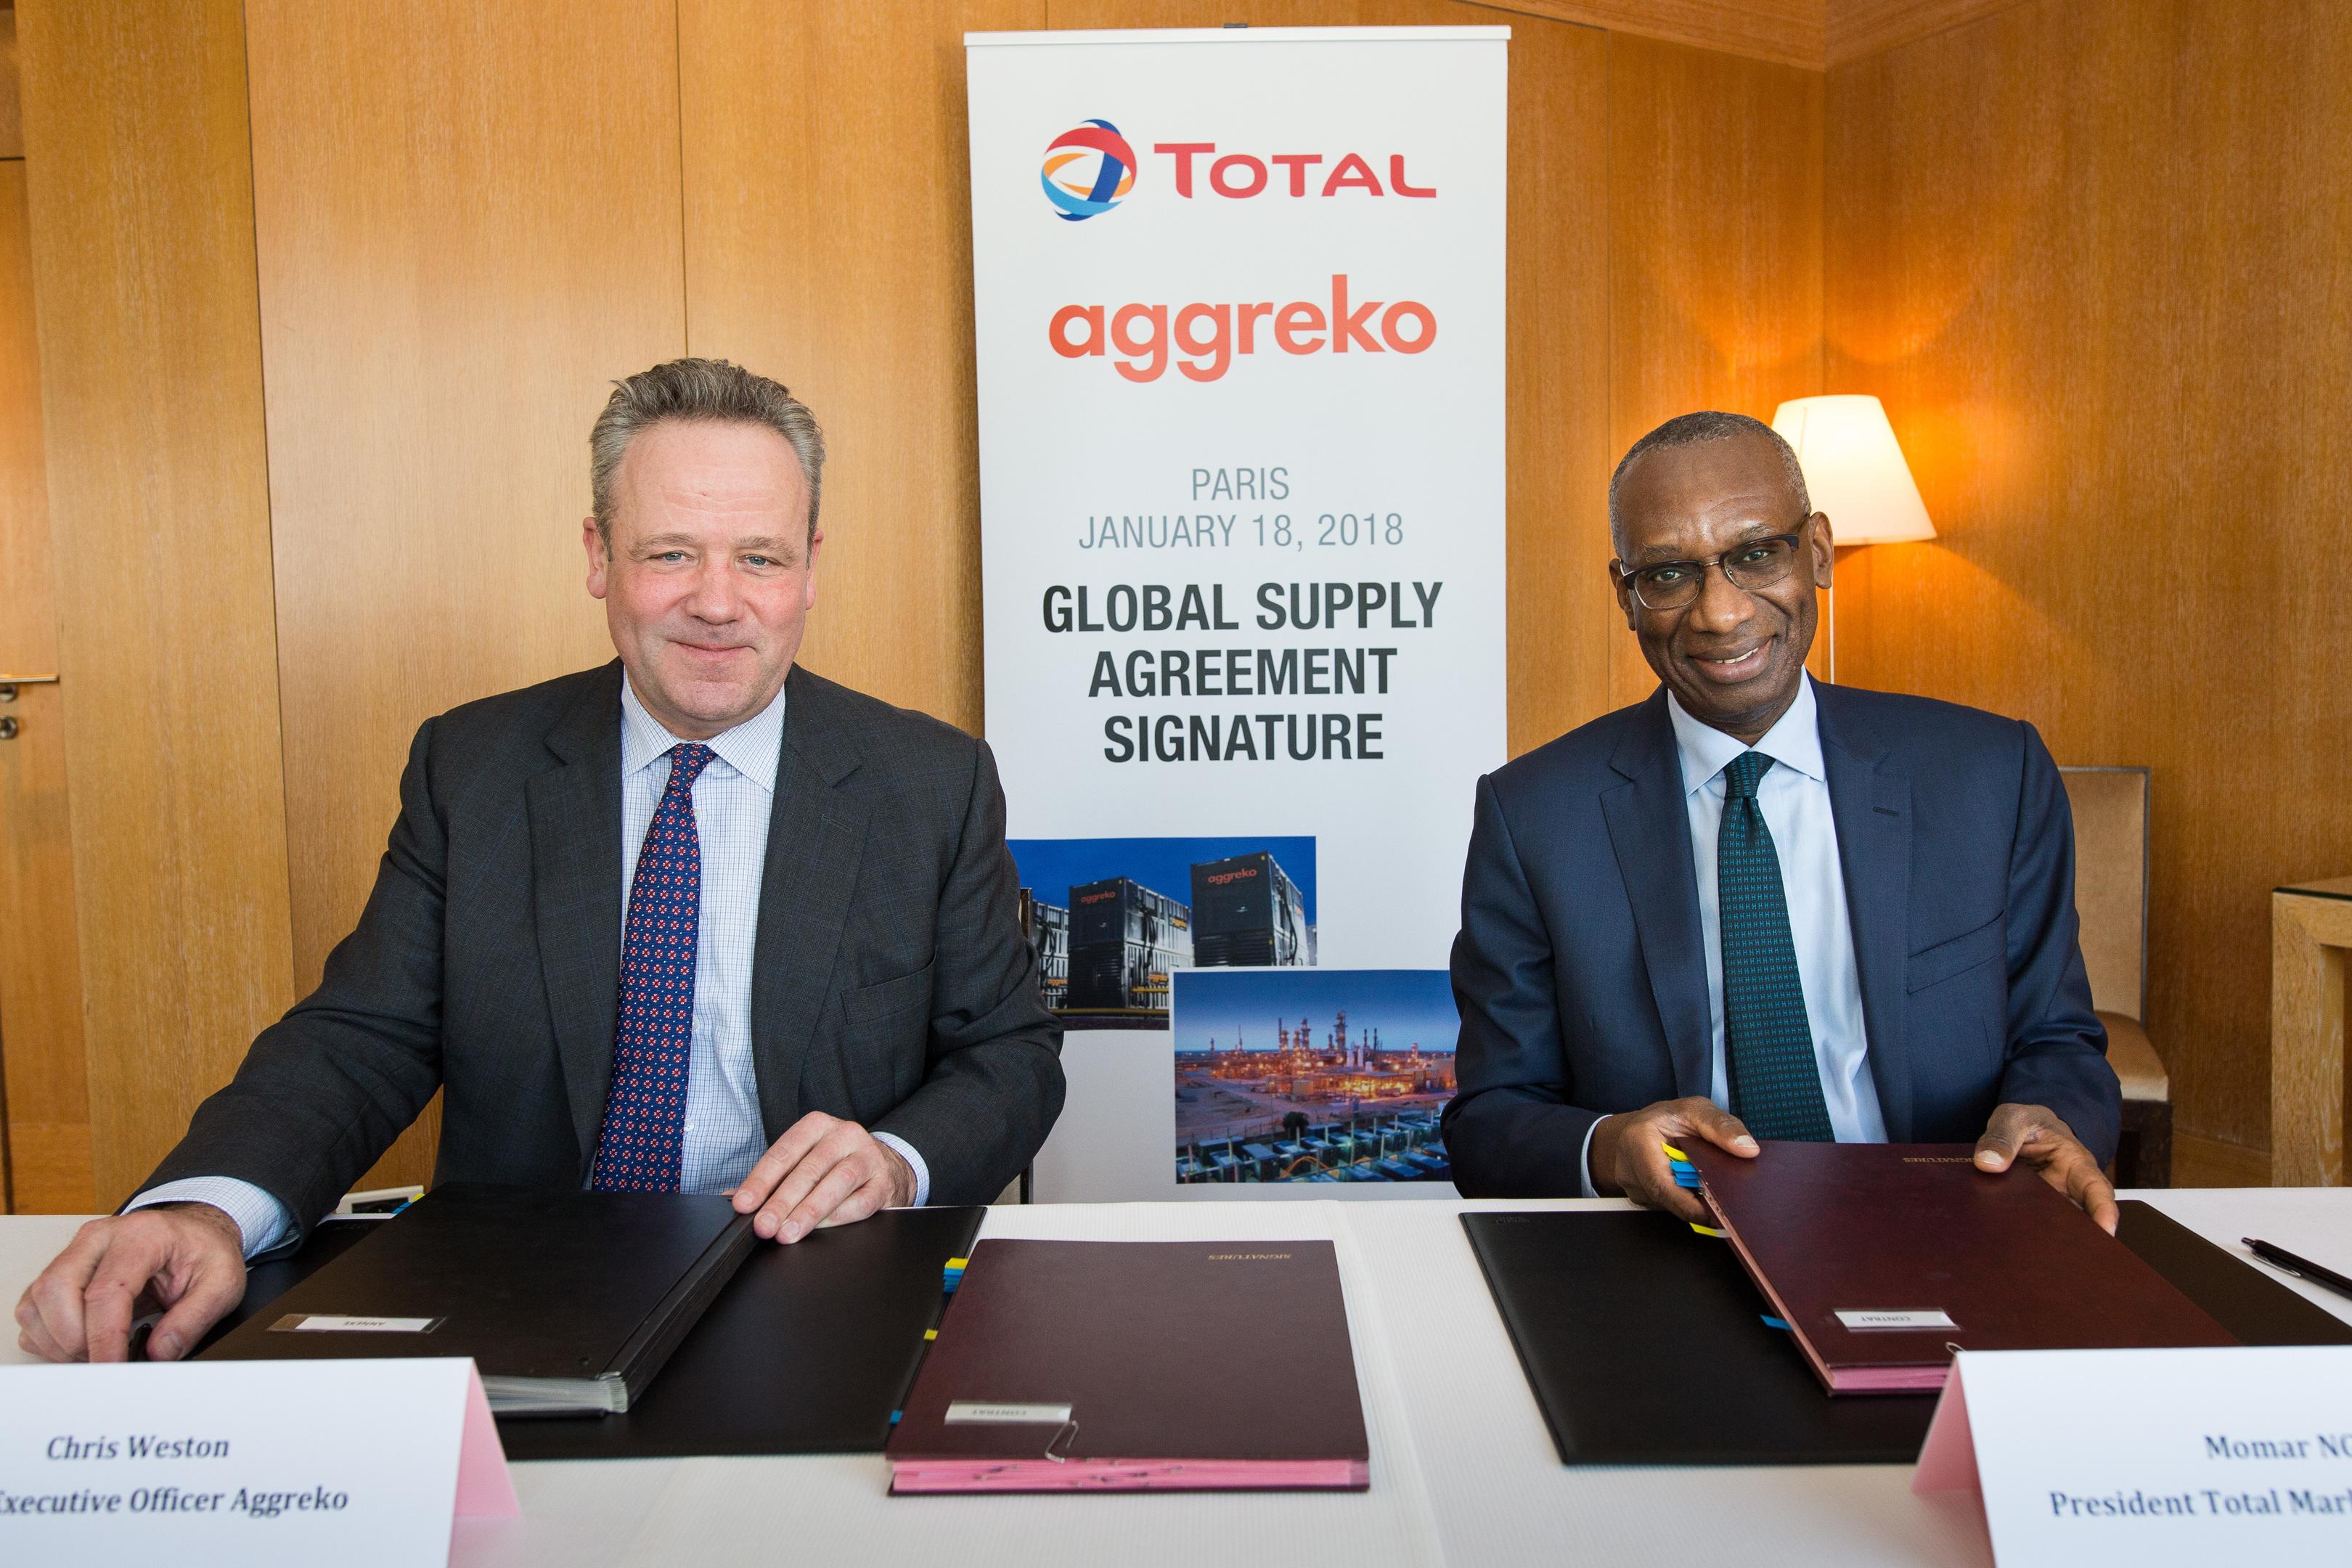 Total Aggreko global supply agreement signature Chris Weston Momar Nguer